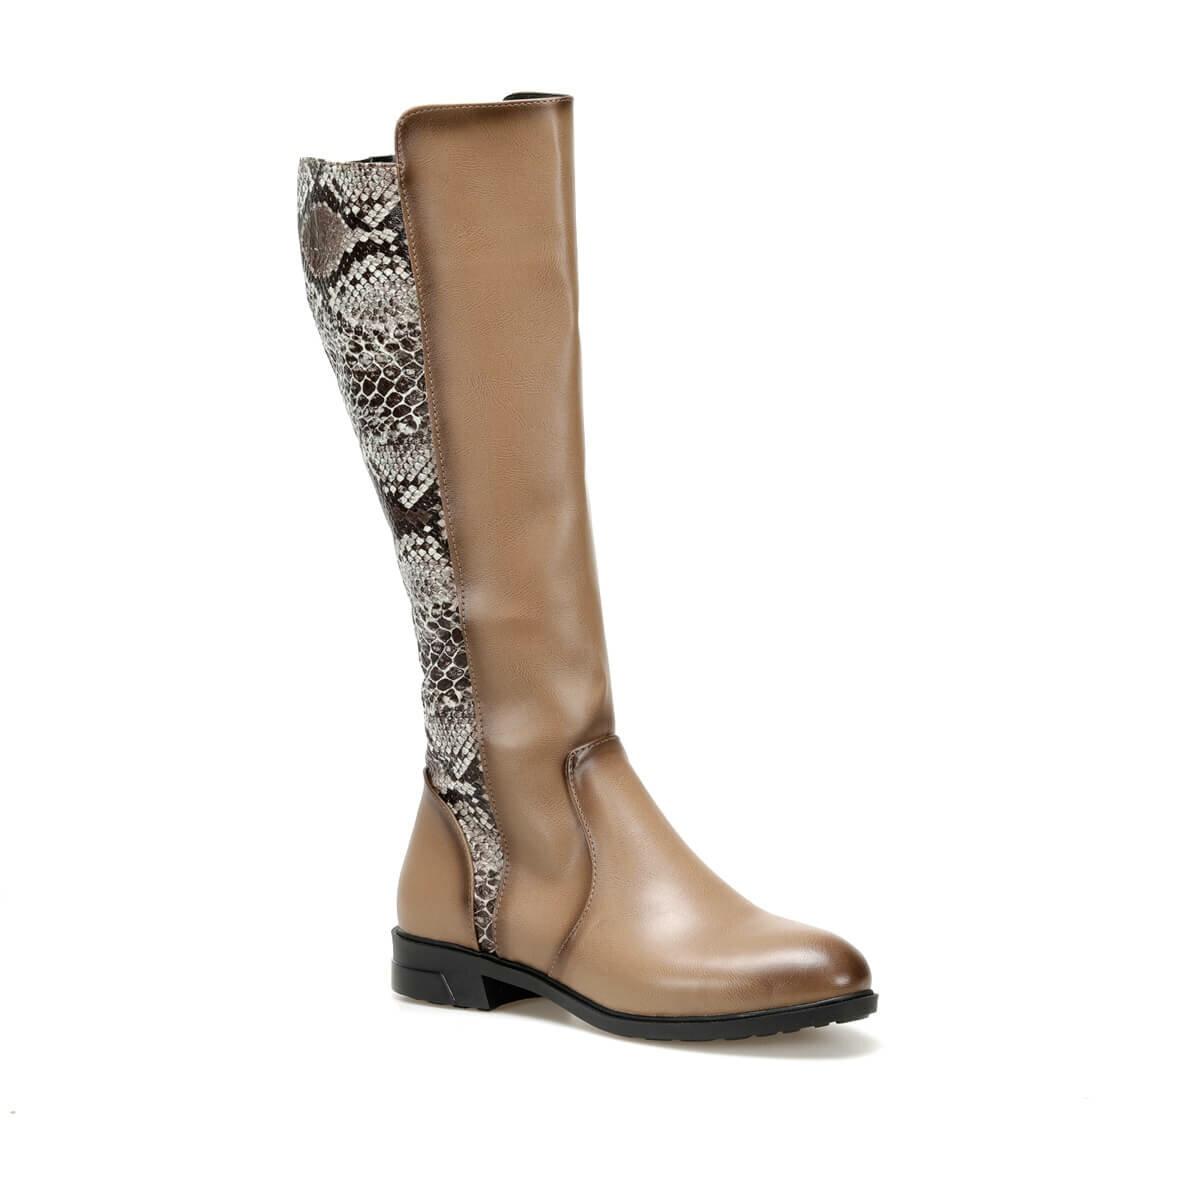 FLO GUARDIOLA11Z SKIN Mink Women 'S Boot BUTIGO